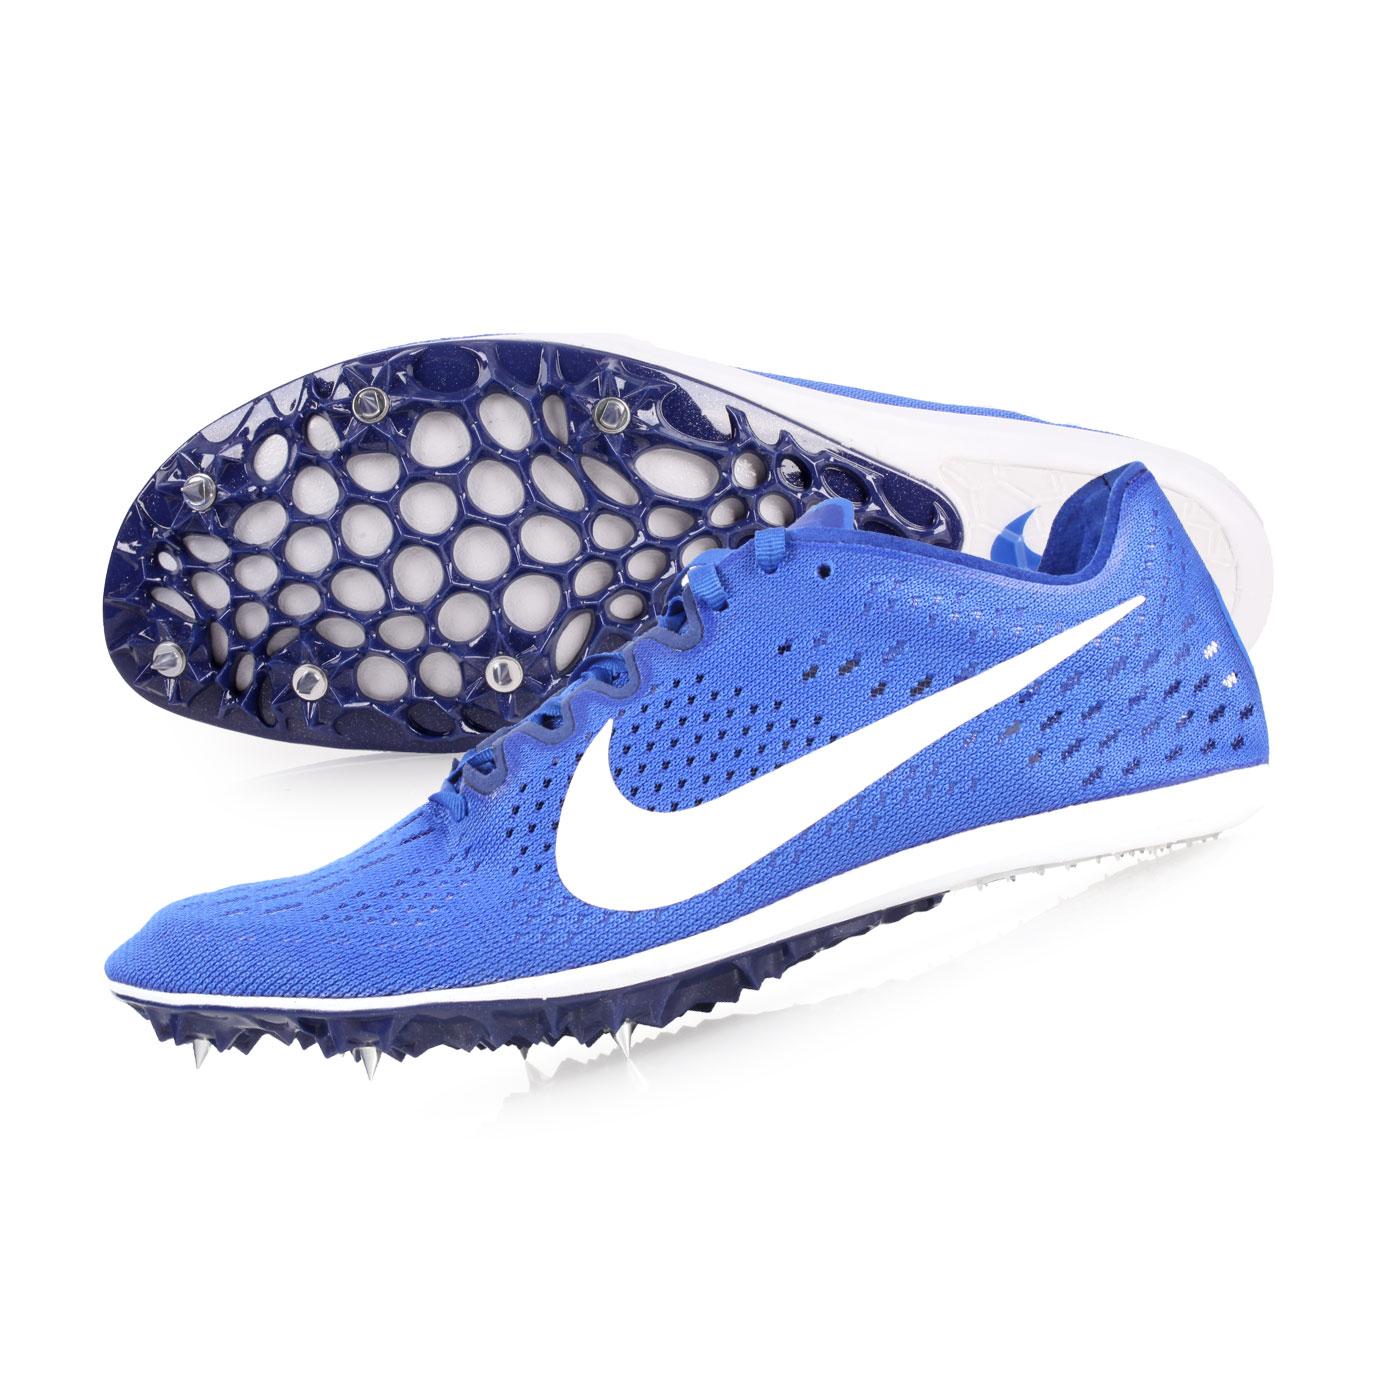 NIKE 田徑釘鞋(中長距離)  @ZOOM VICTORY 3@835997411 - 藍白